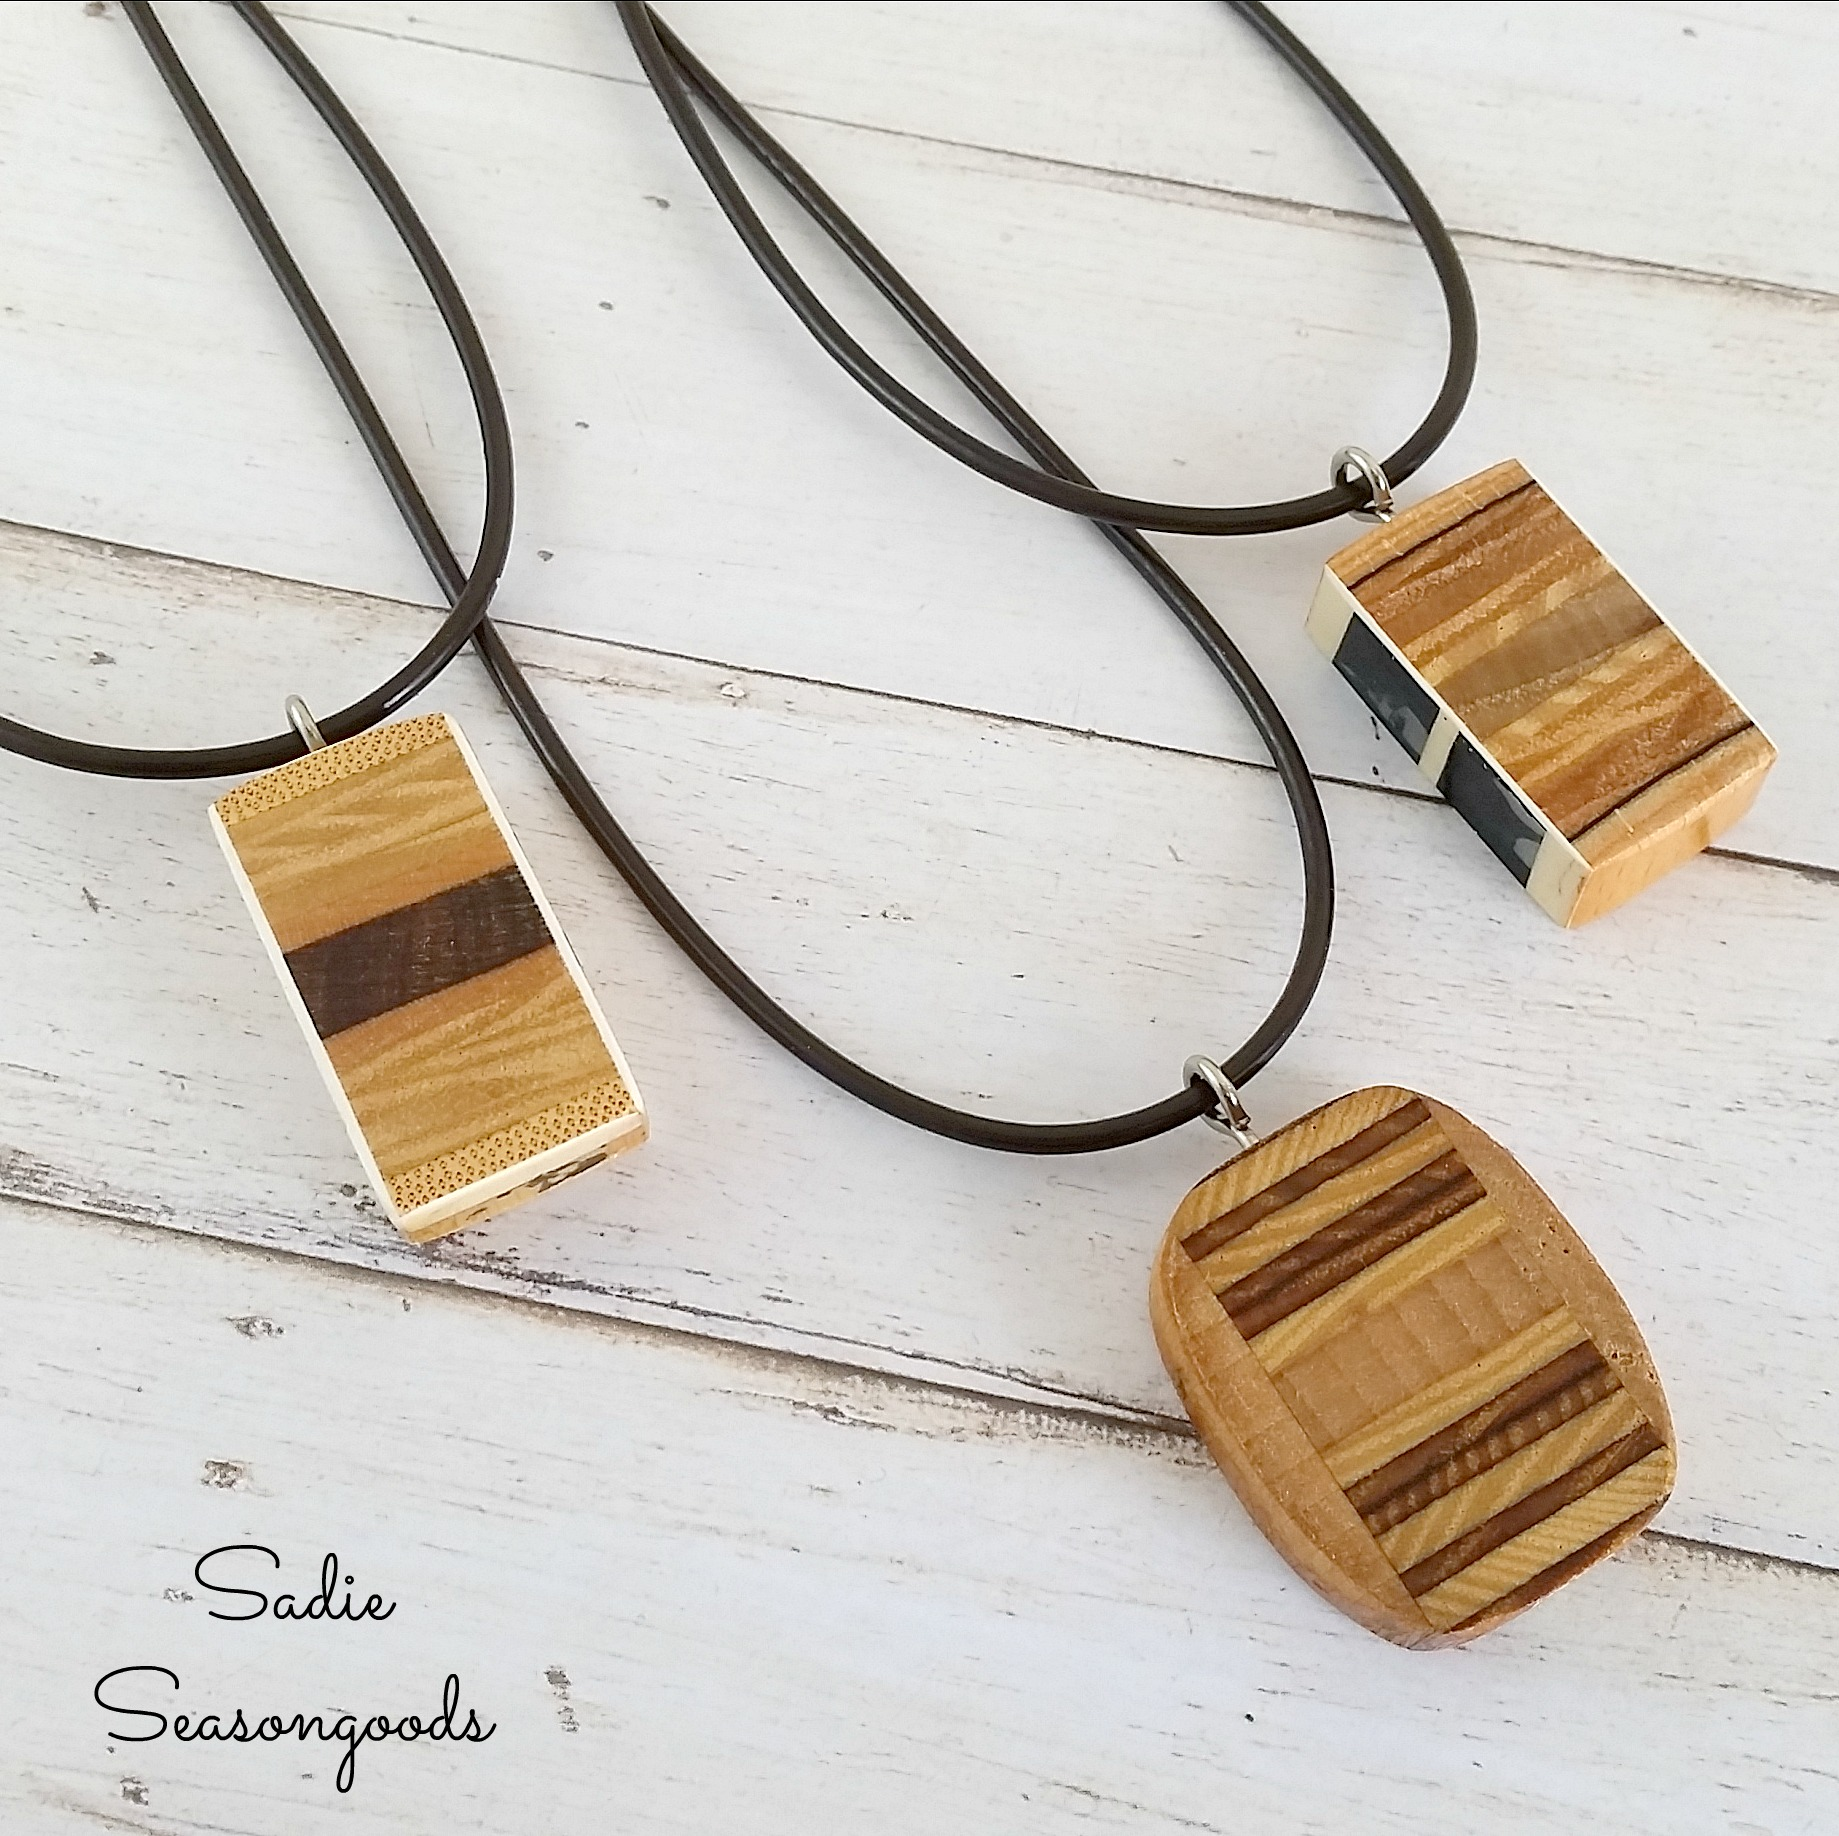 Wooden_necklace_pendants_from_repurposed_upcycled_vintage_wood_tennis_rackets_by_Sadie_Seasongoods